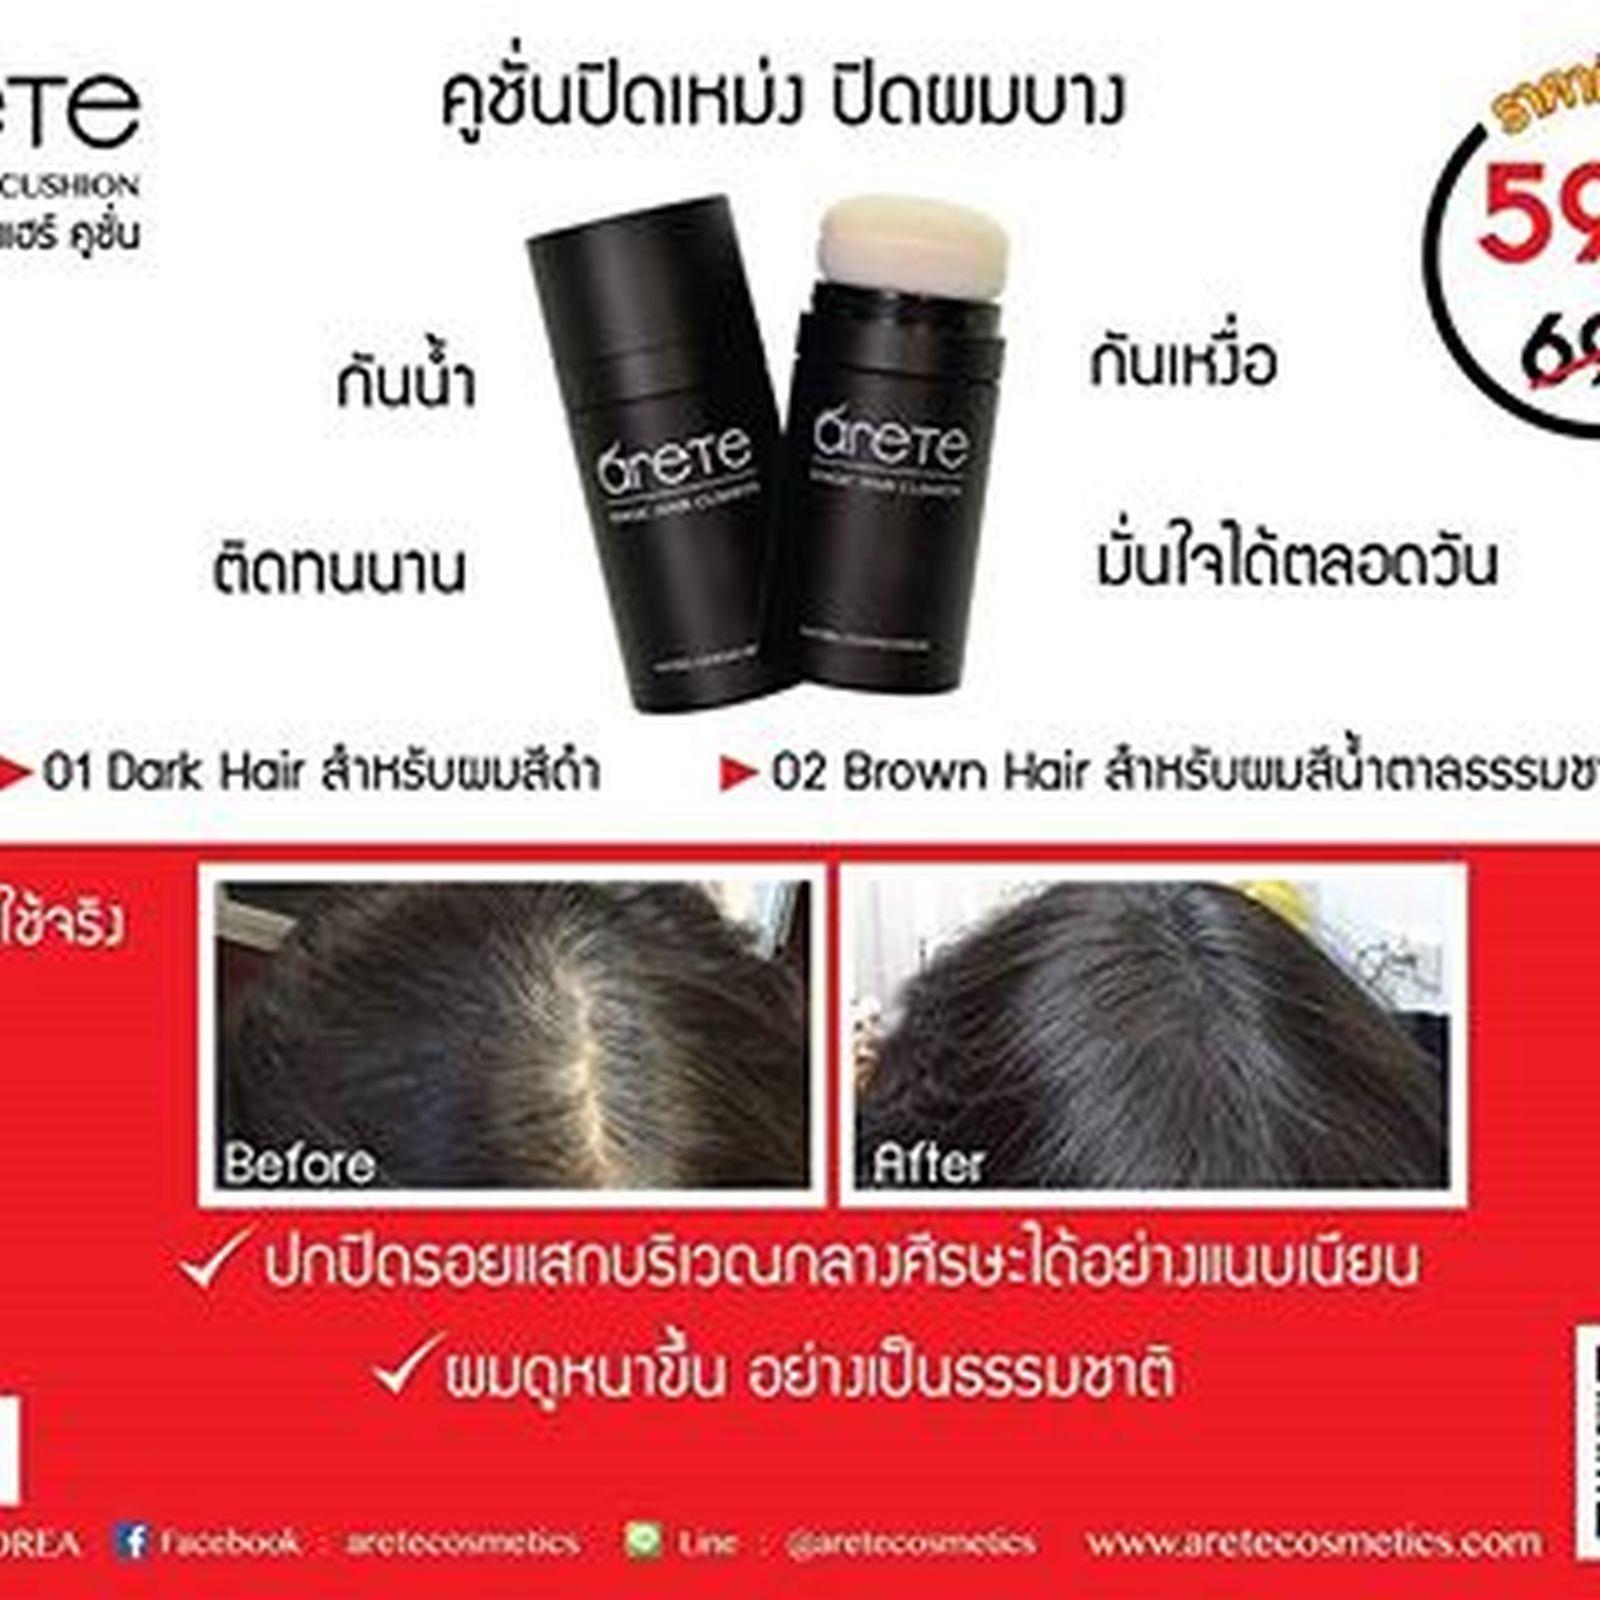 ARETE MAGIC HAIR CUSHION COLOR BLACK 12g. NOURISH HAIR AND SCALP FOR KOREA NEW